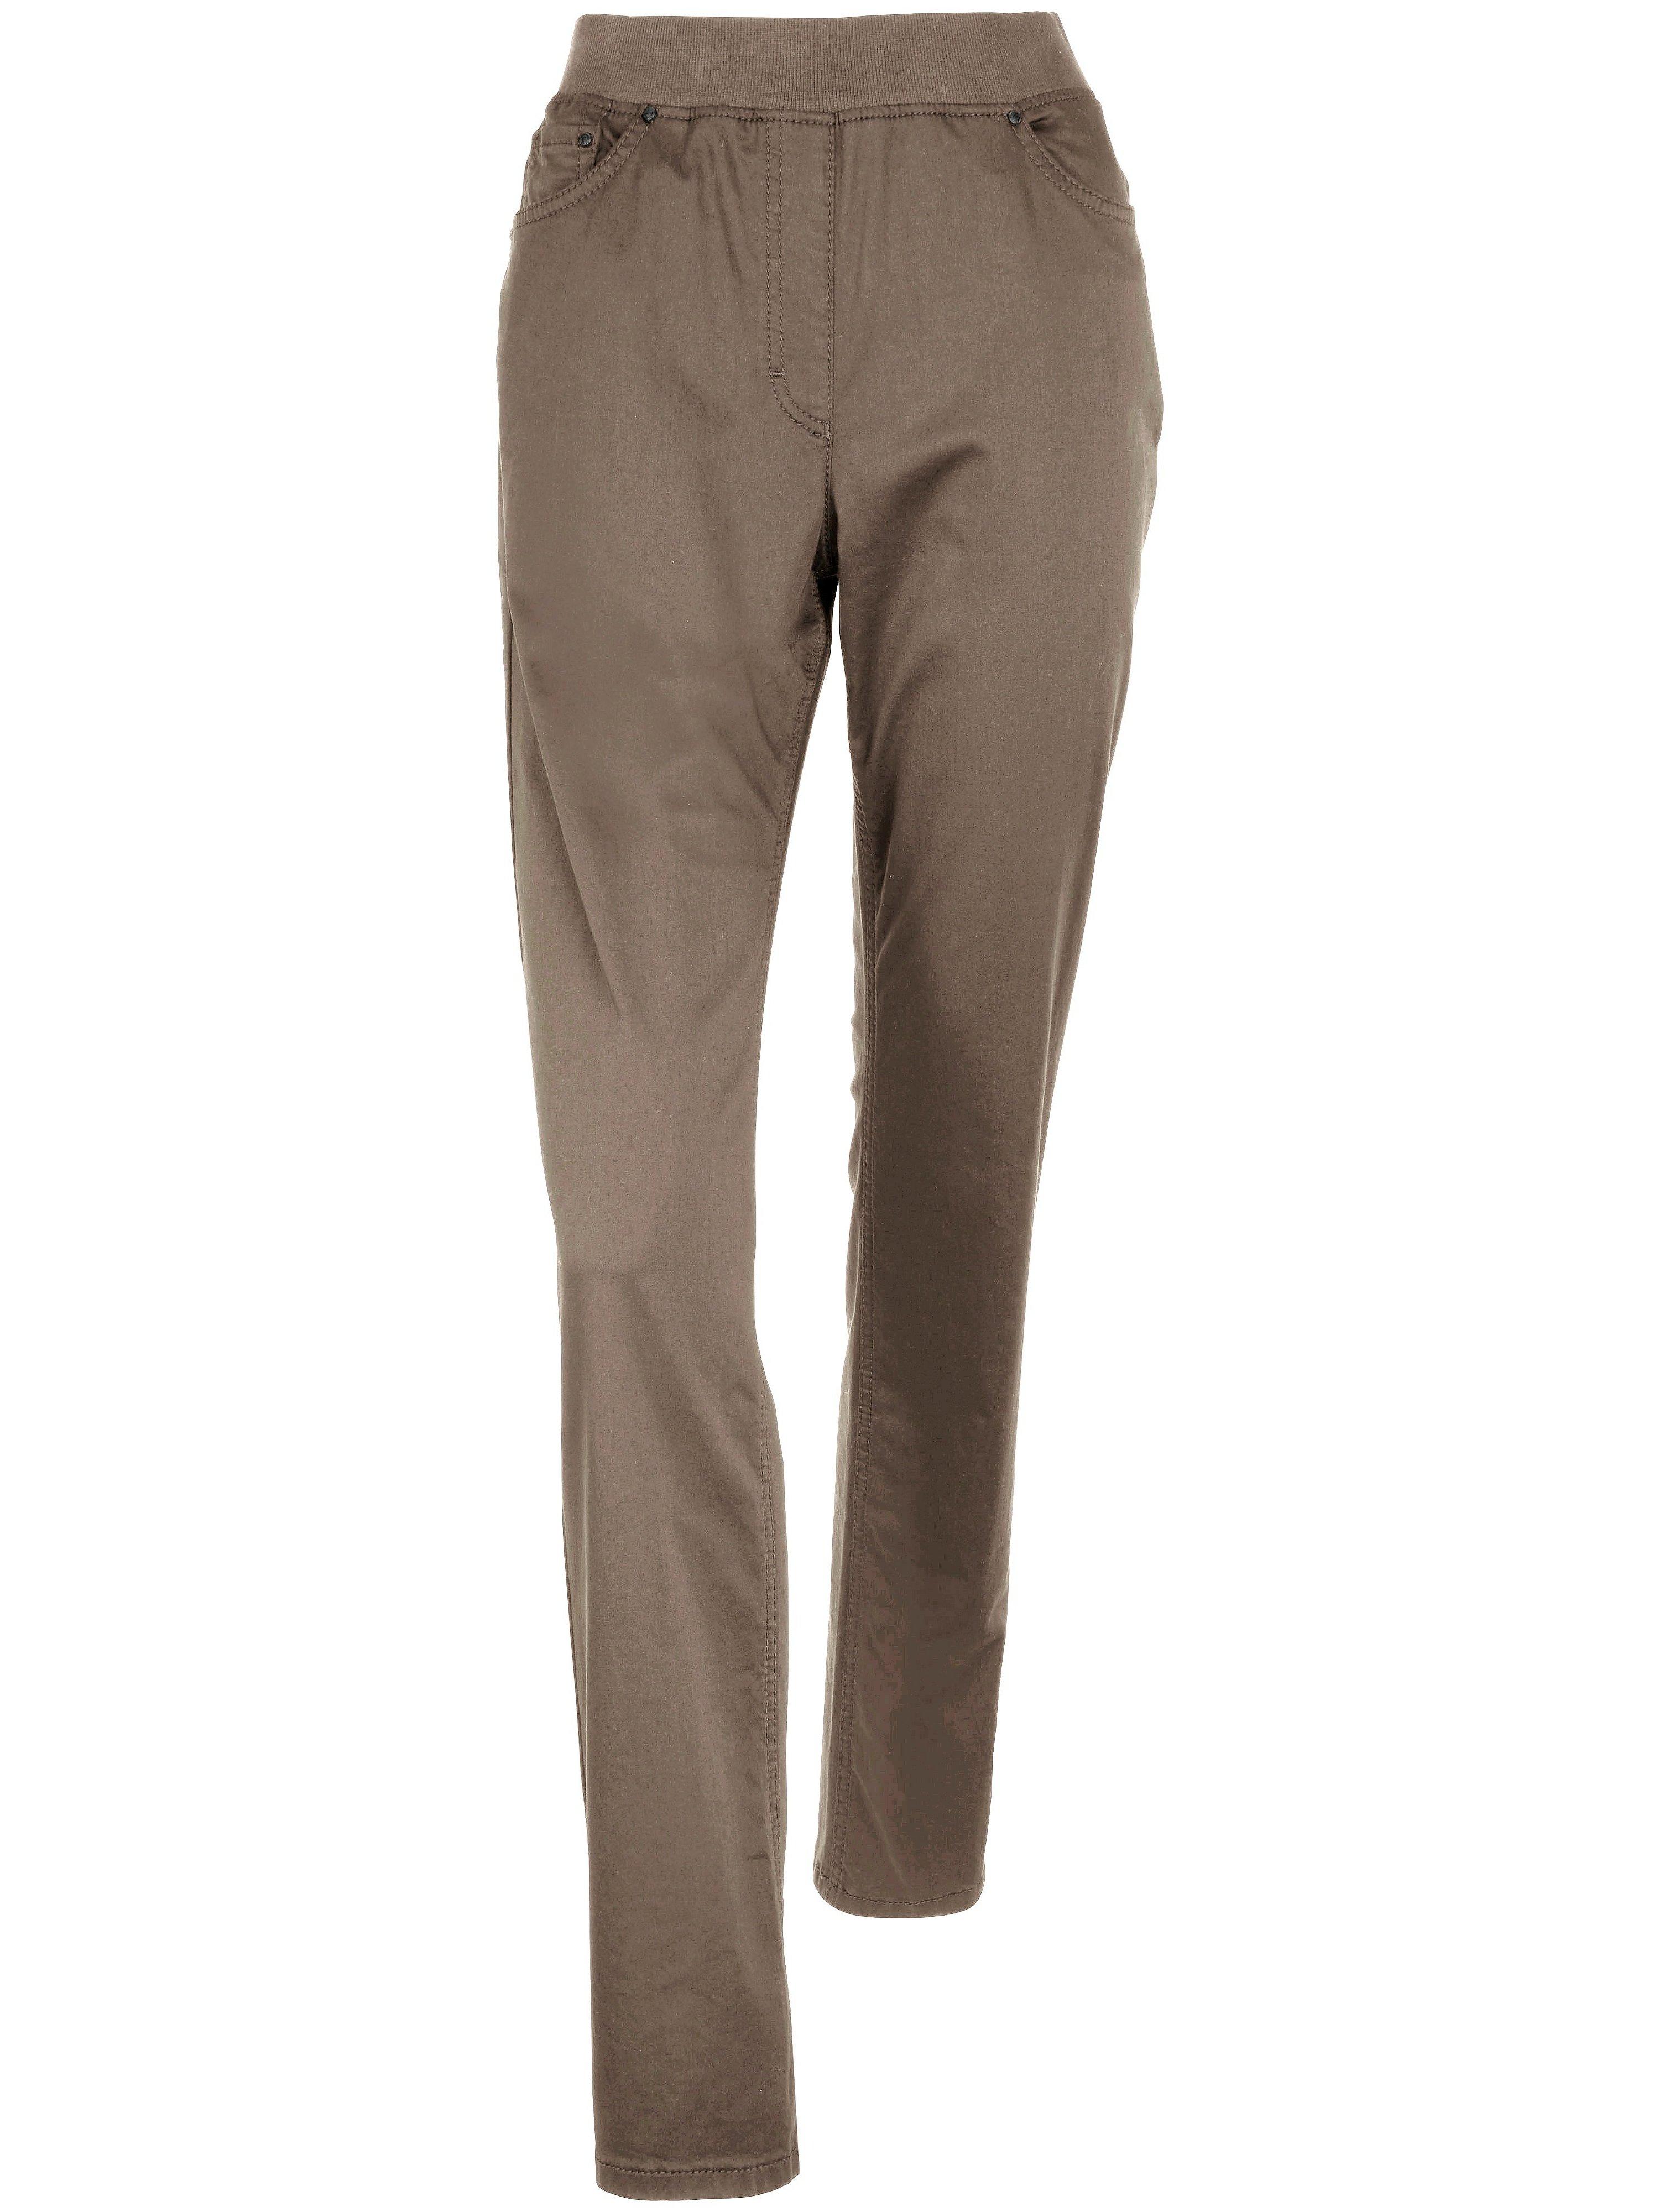 Comfort Plus slip-on trousers design Carina Raphaela by Brax beige